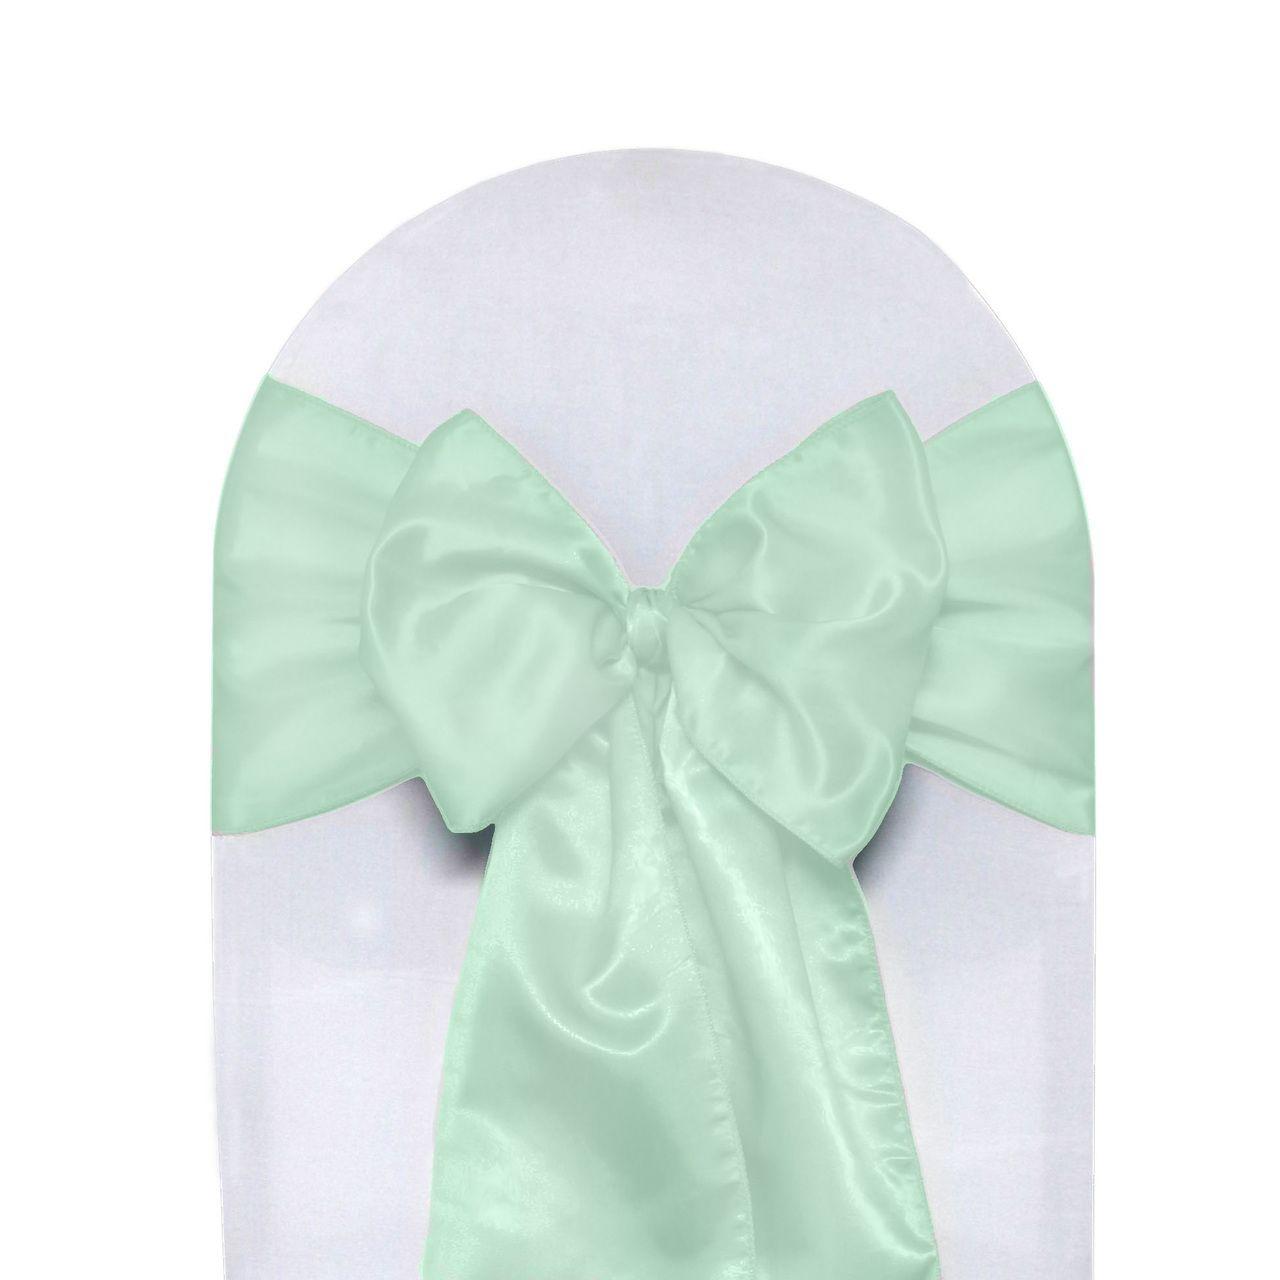 10 Pack Satin Sashes Mint Green Satin Sash Wedding Chair Sashes Chair Covers Wedding